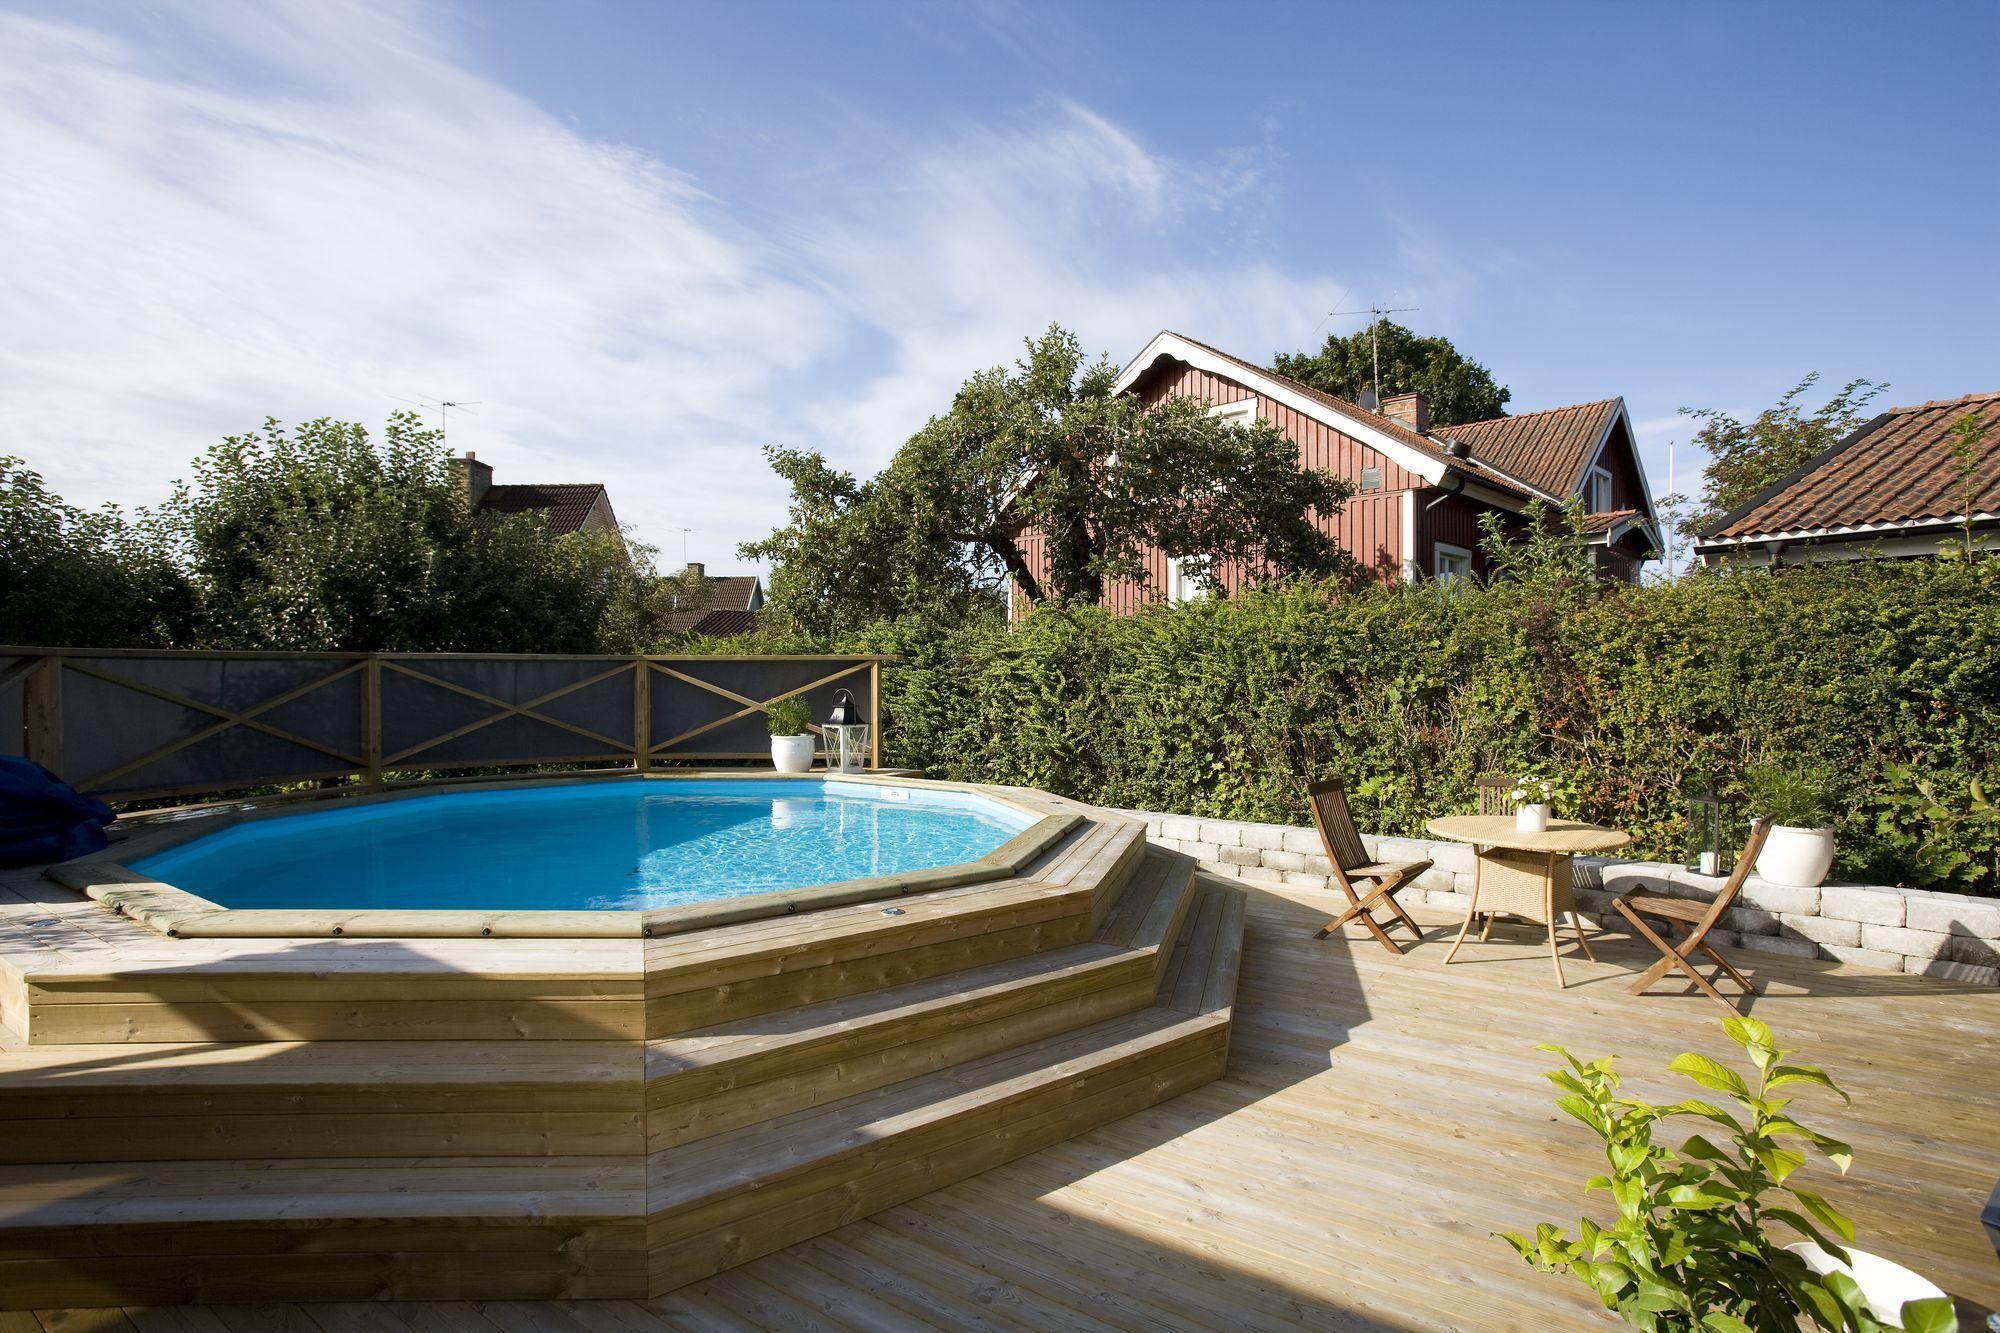 Wood Deck Round Above Ground Pool Buscar Con Google Pool Anlagga Pool Pooldack